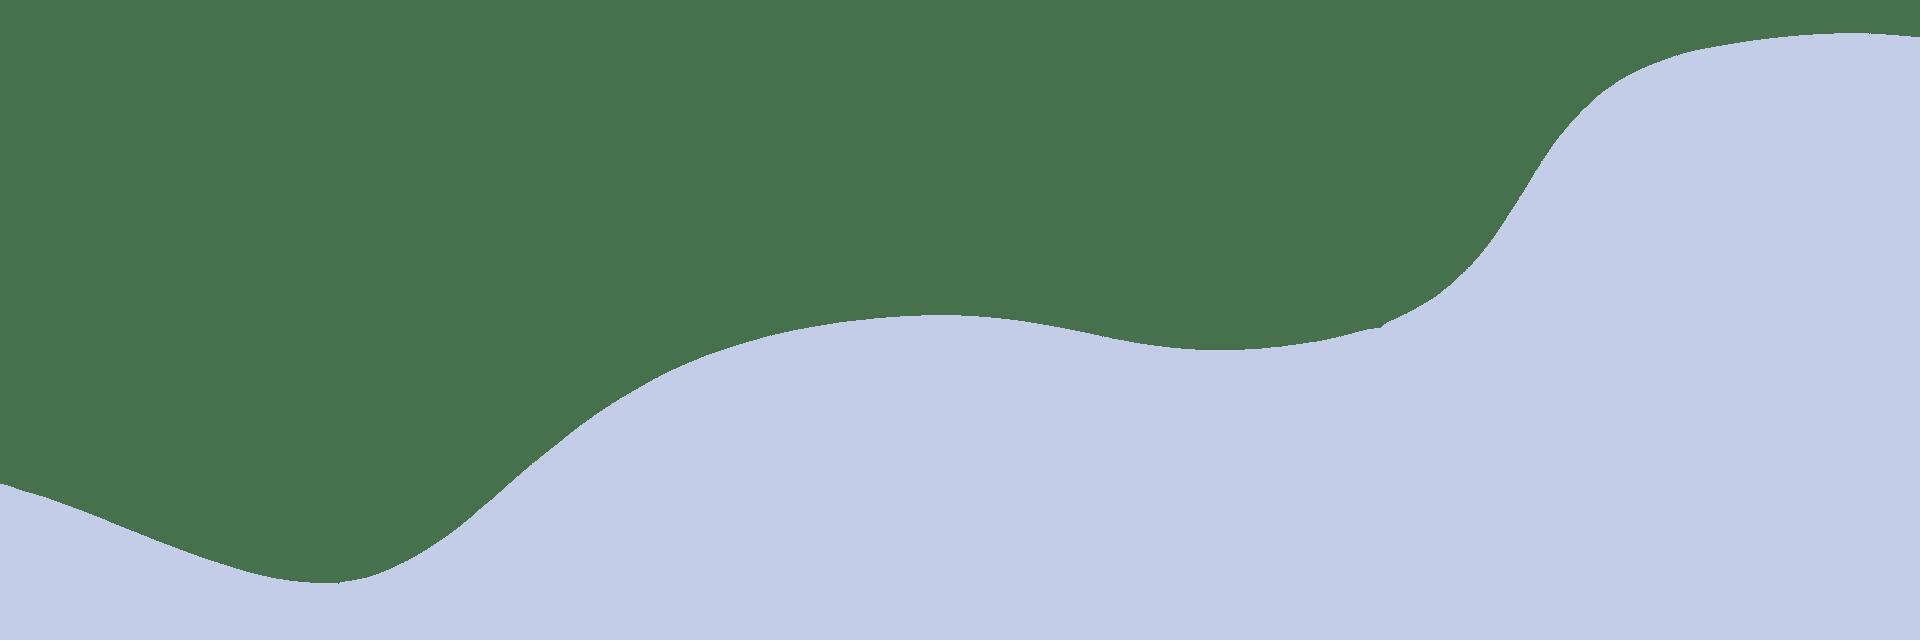 graph4_1